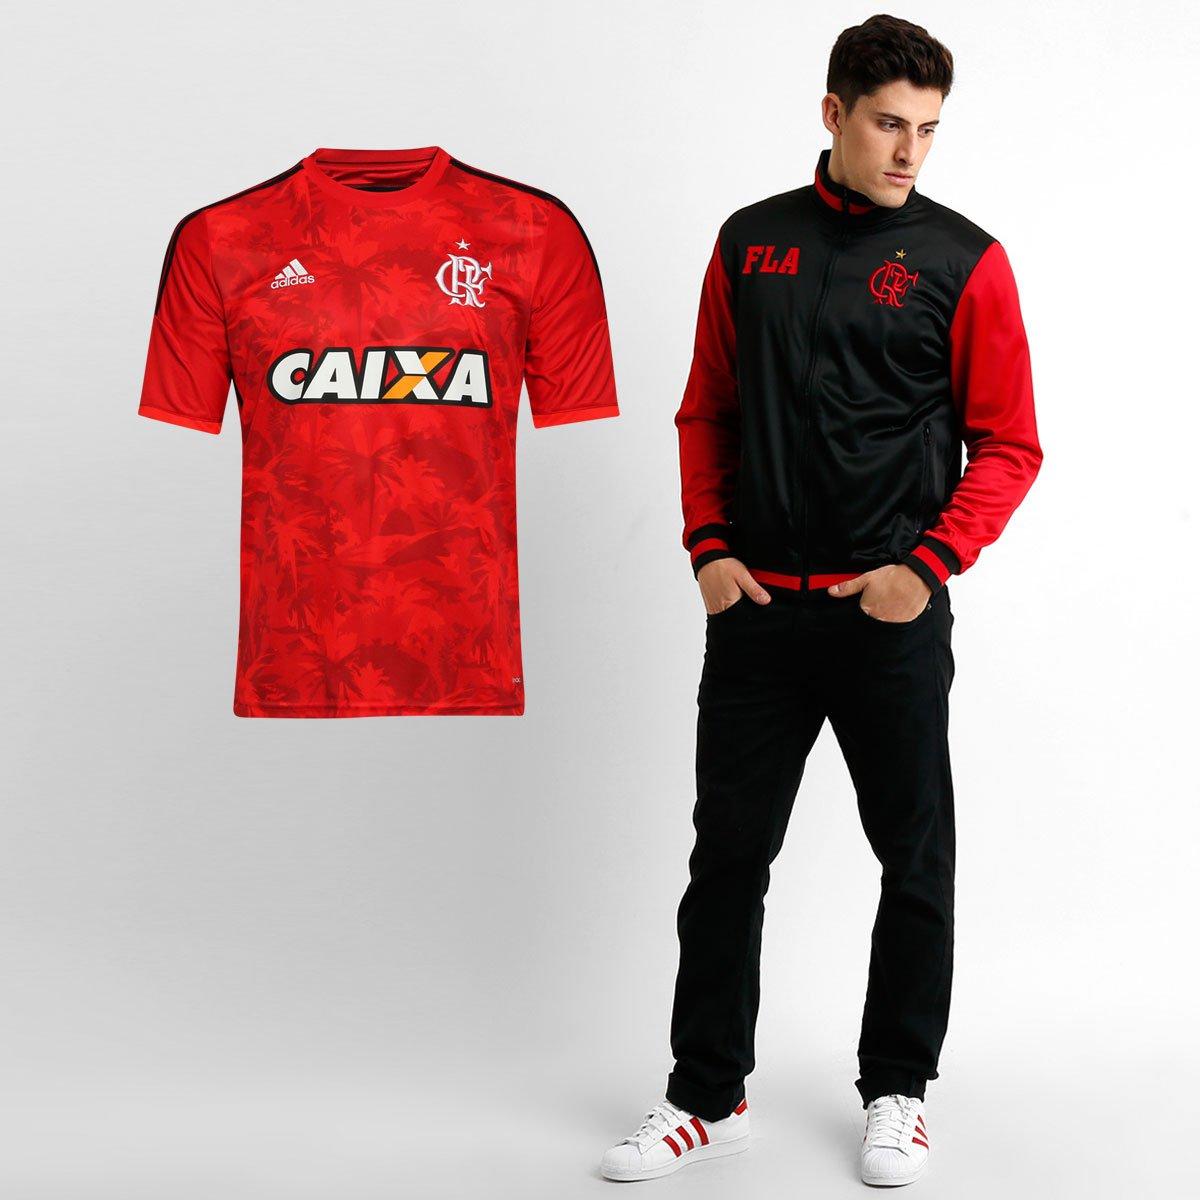 acdc926f06 Kit Flamengo - Camisa Adidas Flamengo III 14 15 + Jaqueta Tibet - Compre  Agora